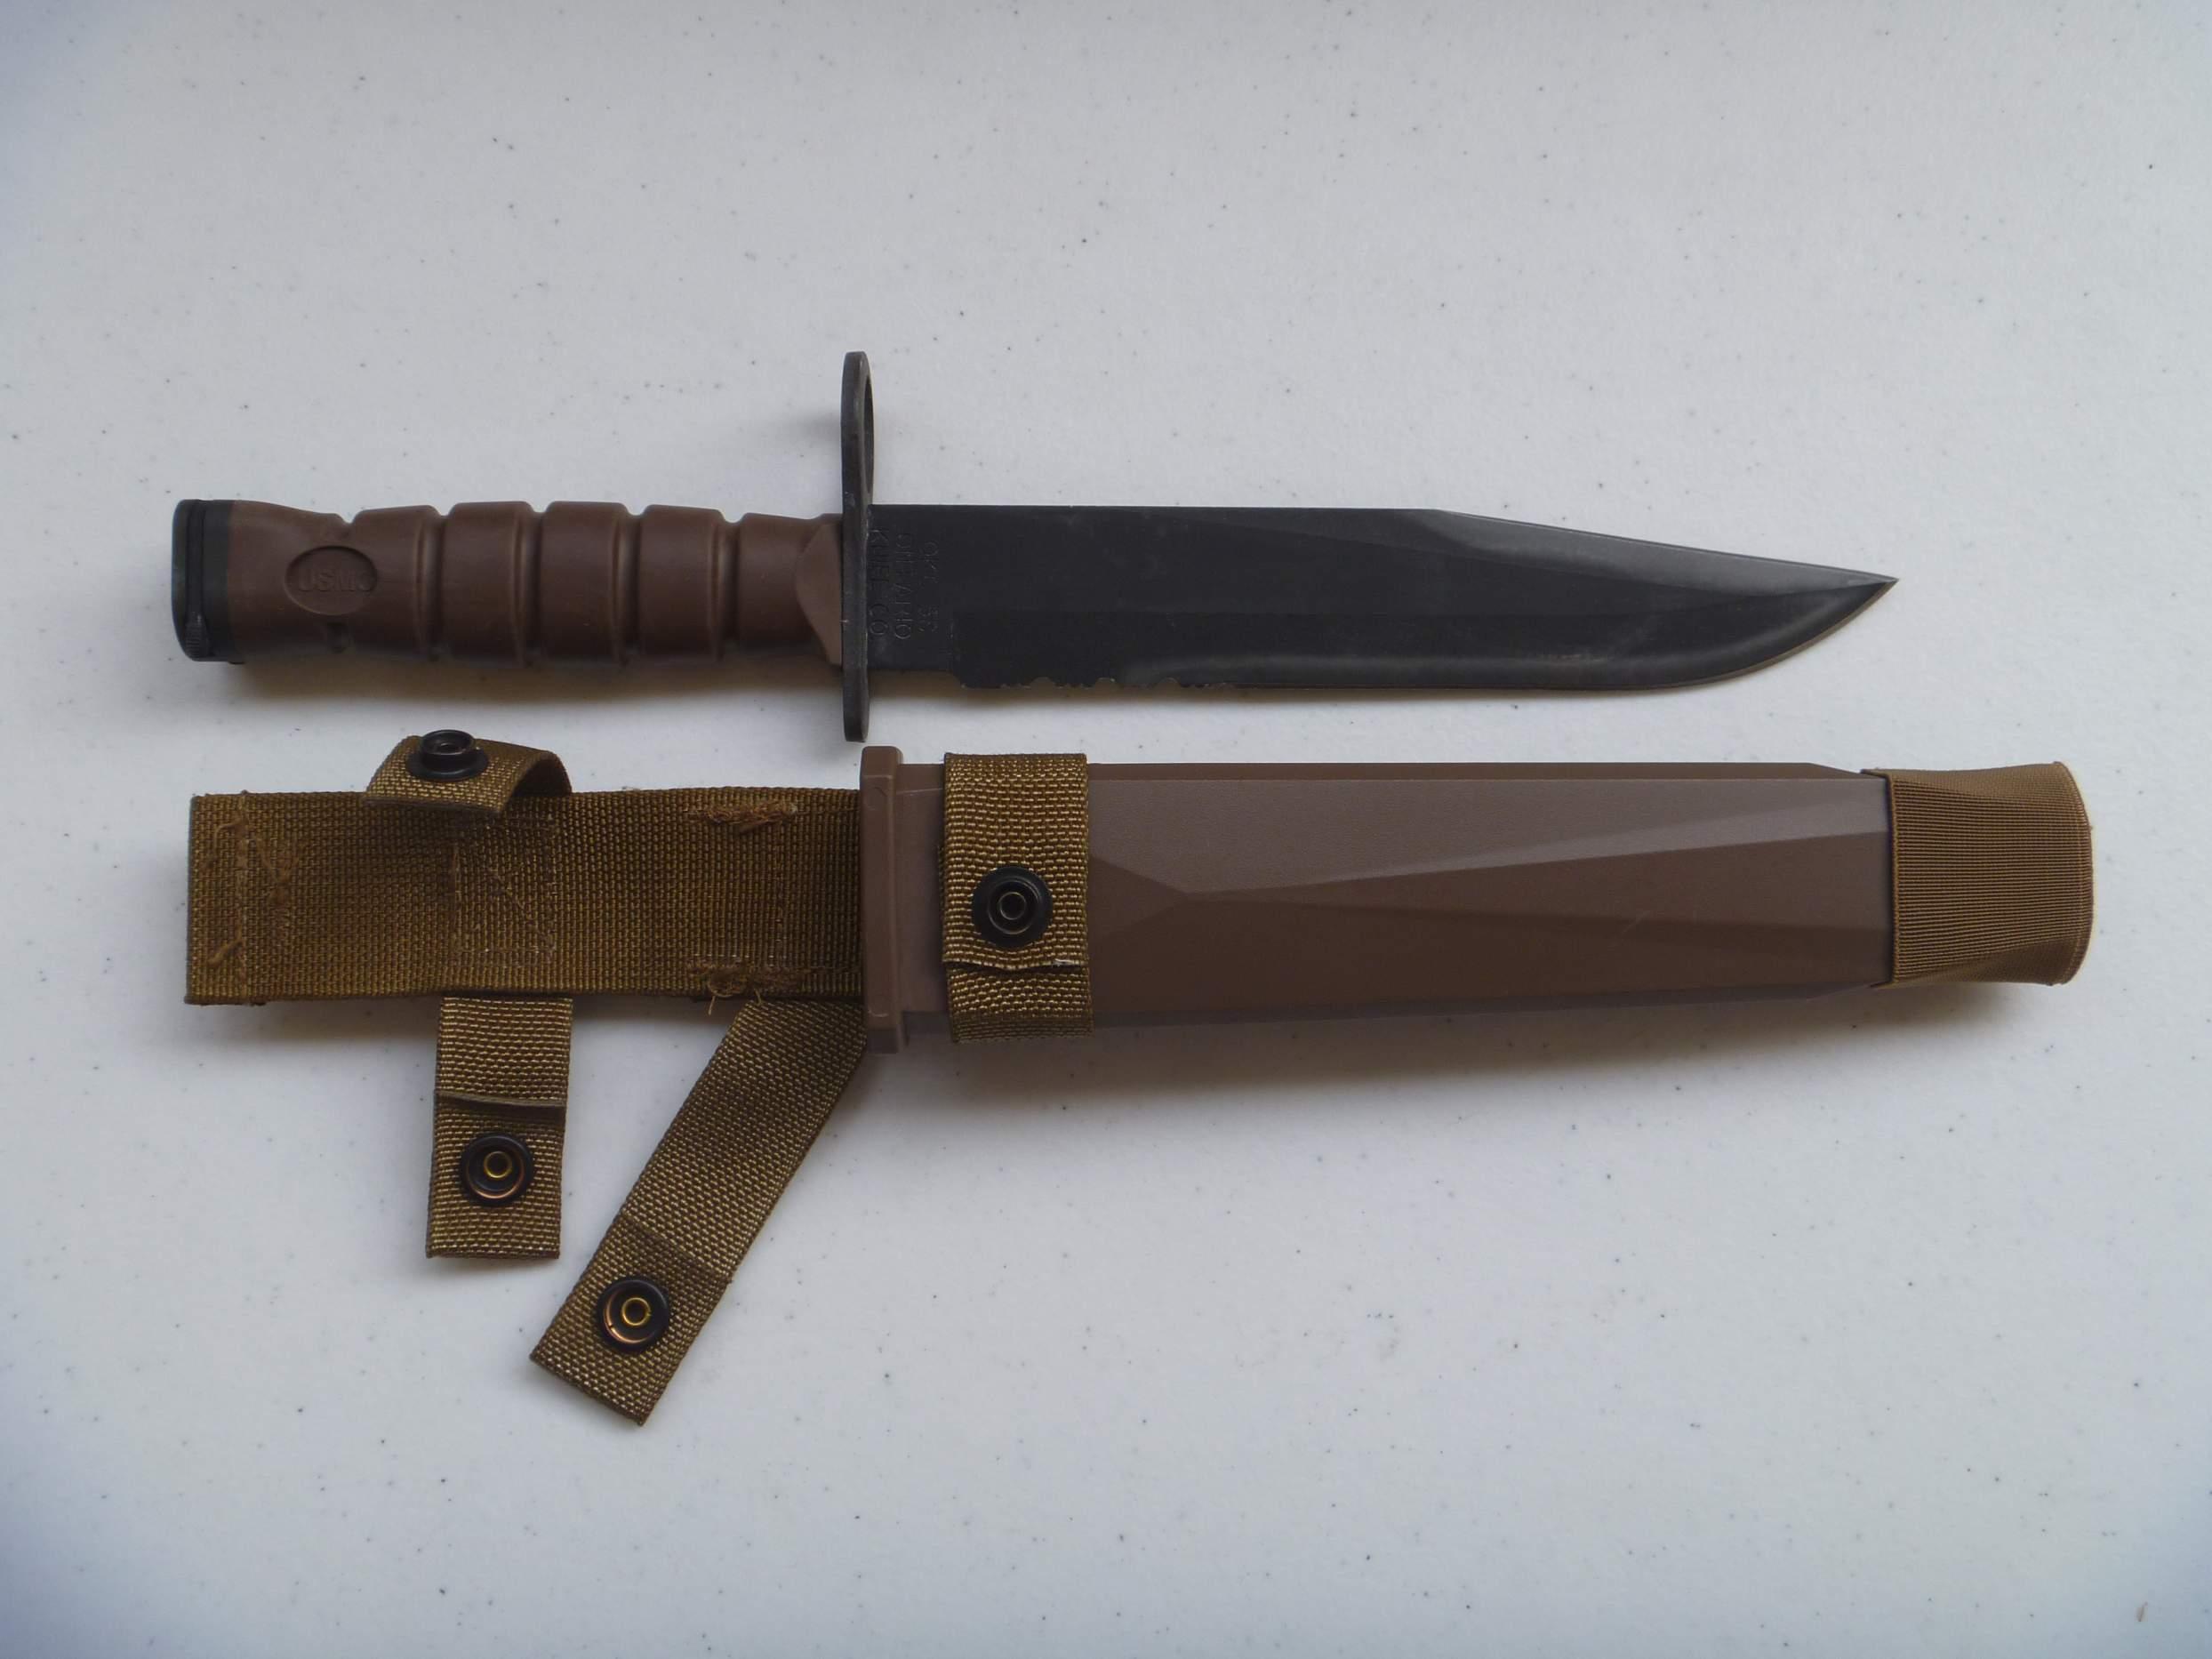 Usmc Okc 3s Bayonet